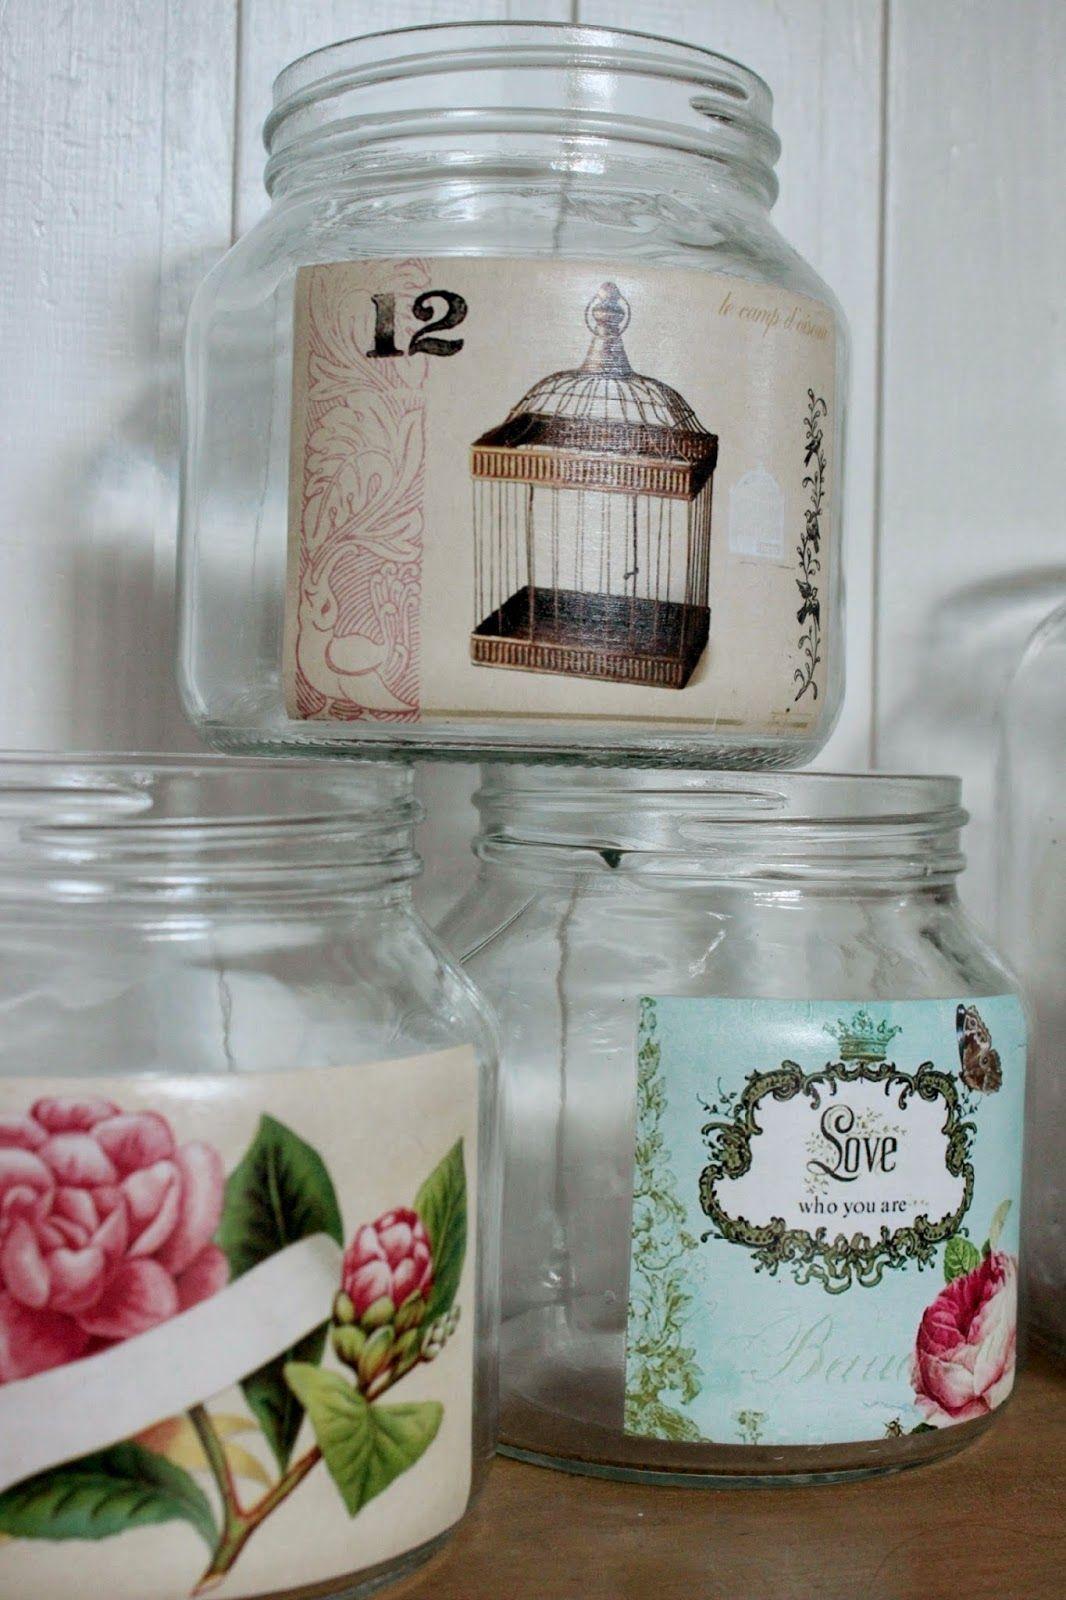 Frascos sencillos con decoupage frascos de vidrio - Diy frascos decorados ...